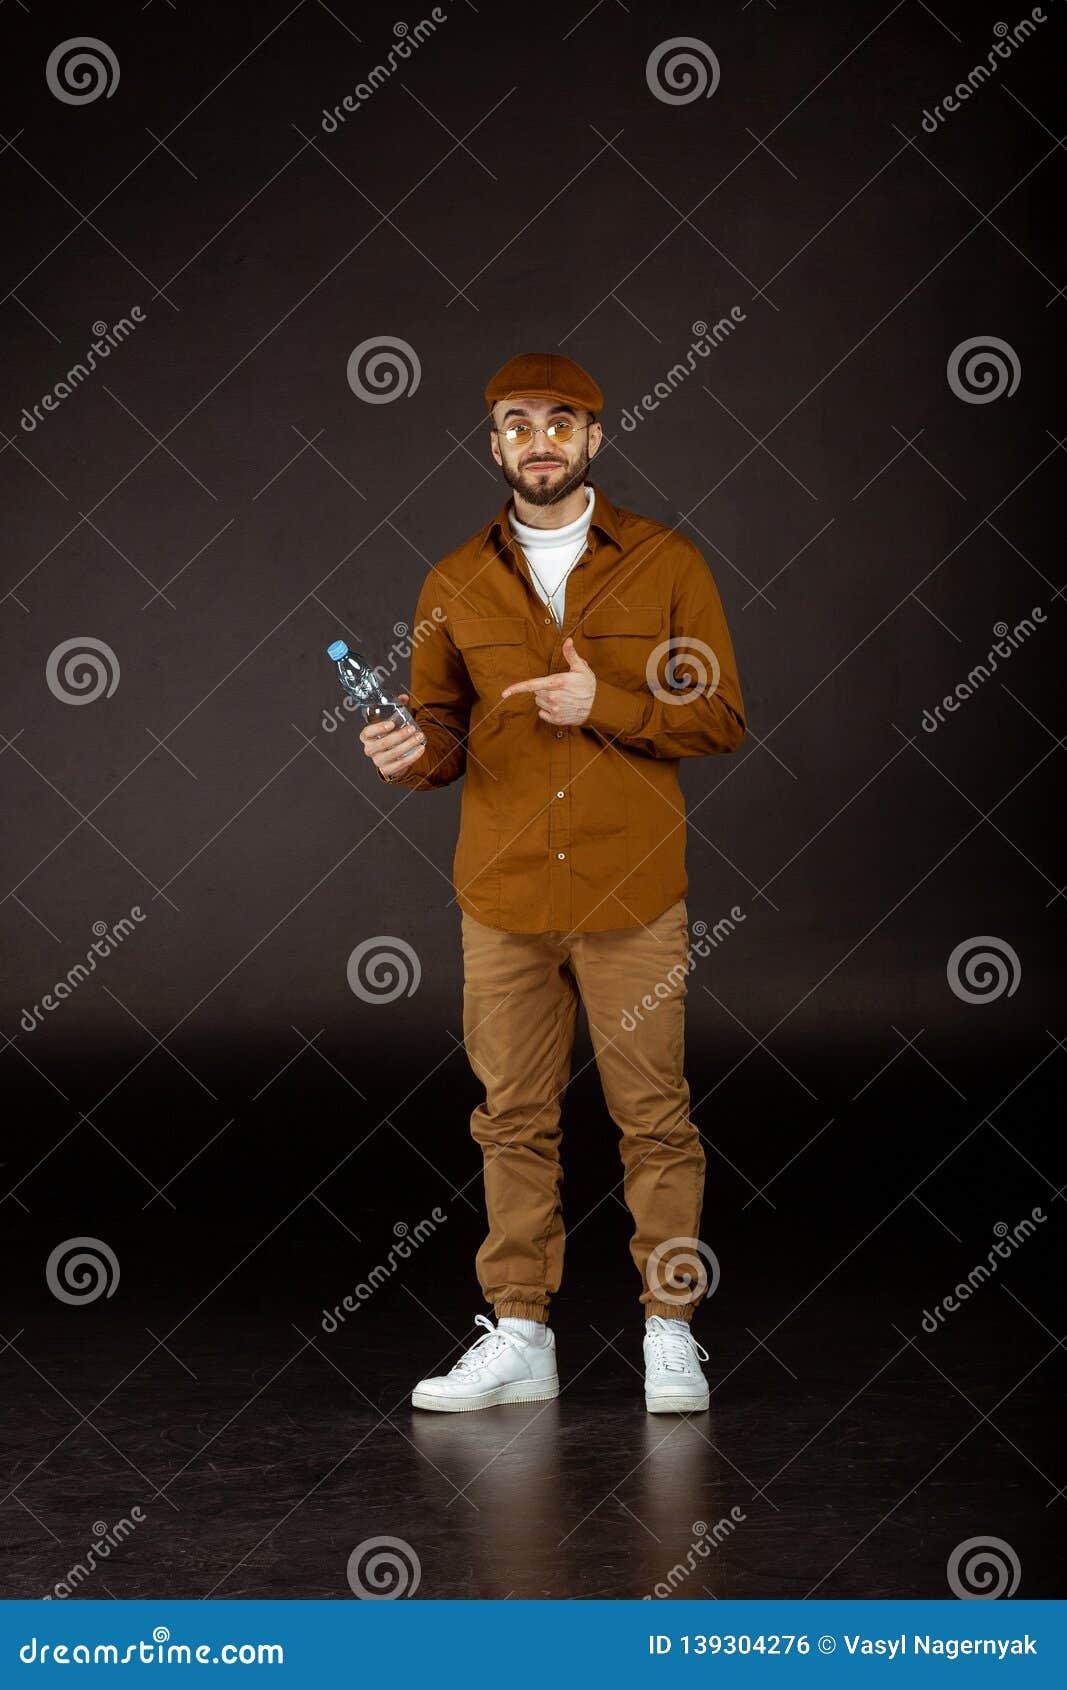 Handsome confident male model in yellowe sunglasses